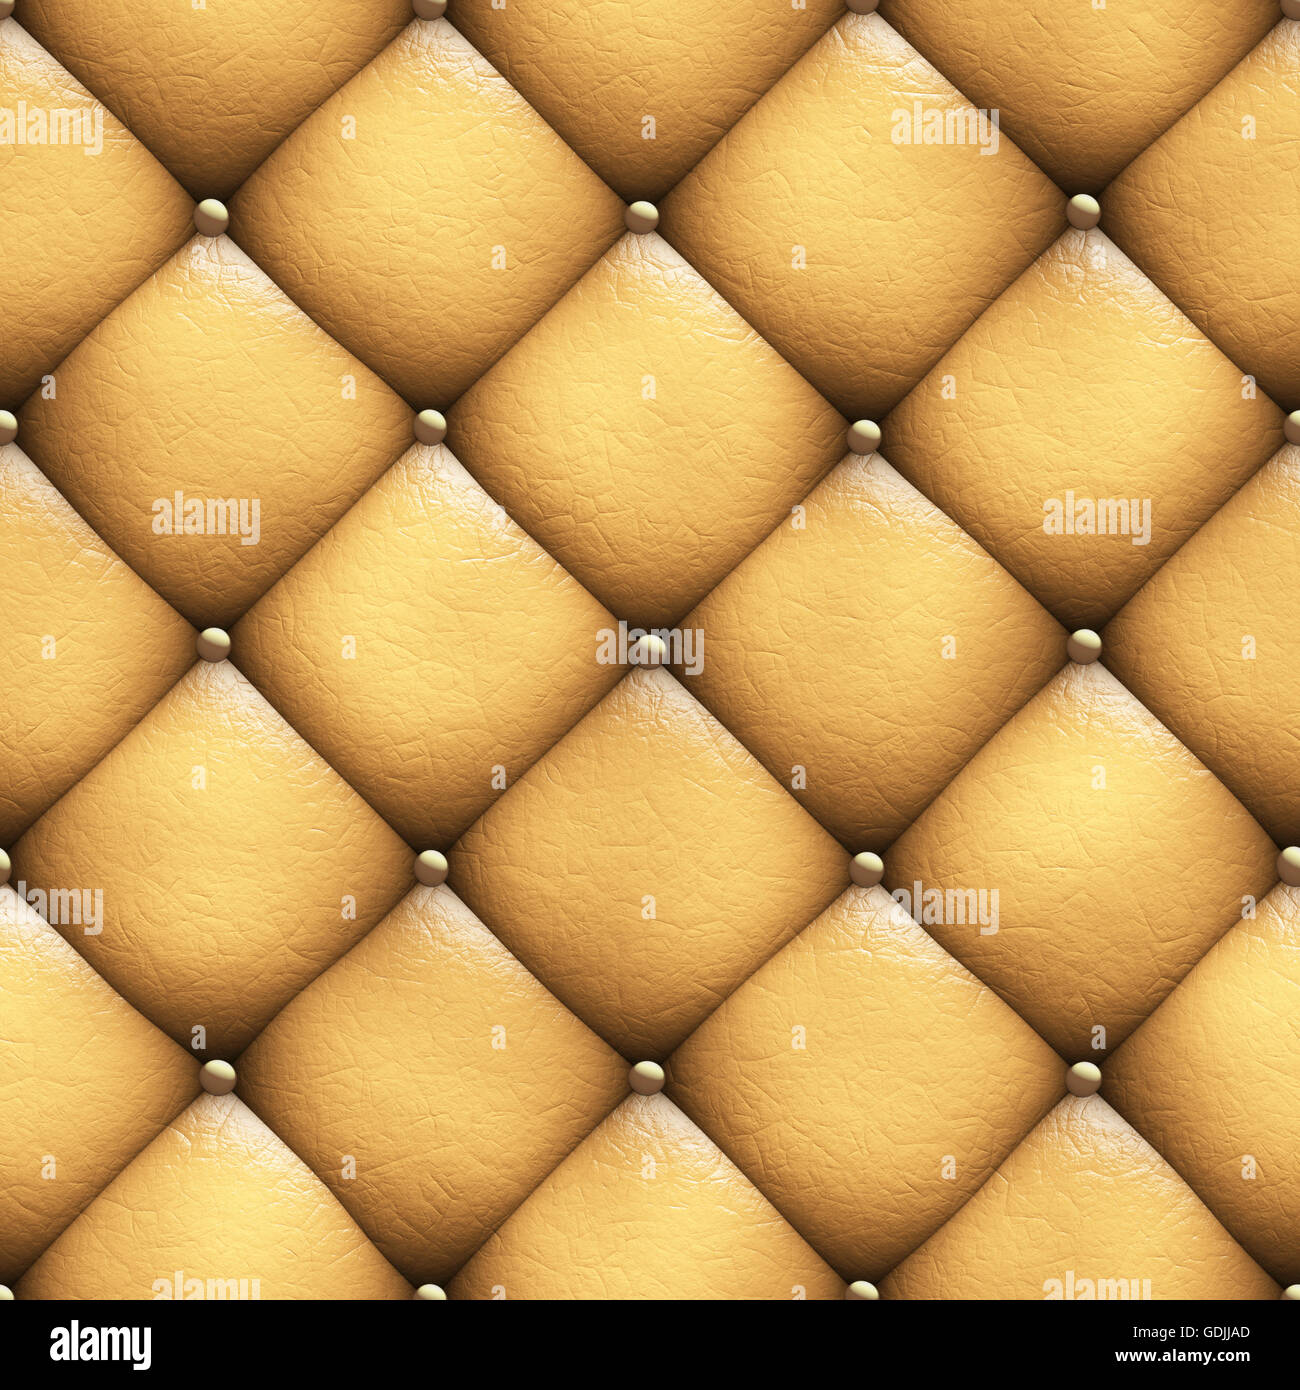 Texture Pelle Divano.Seamless Texture Selleria In Pelle Divano 3d Illustrazione